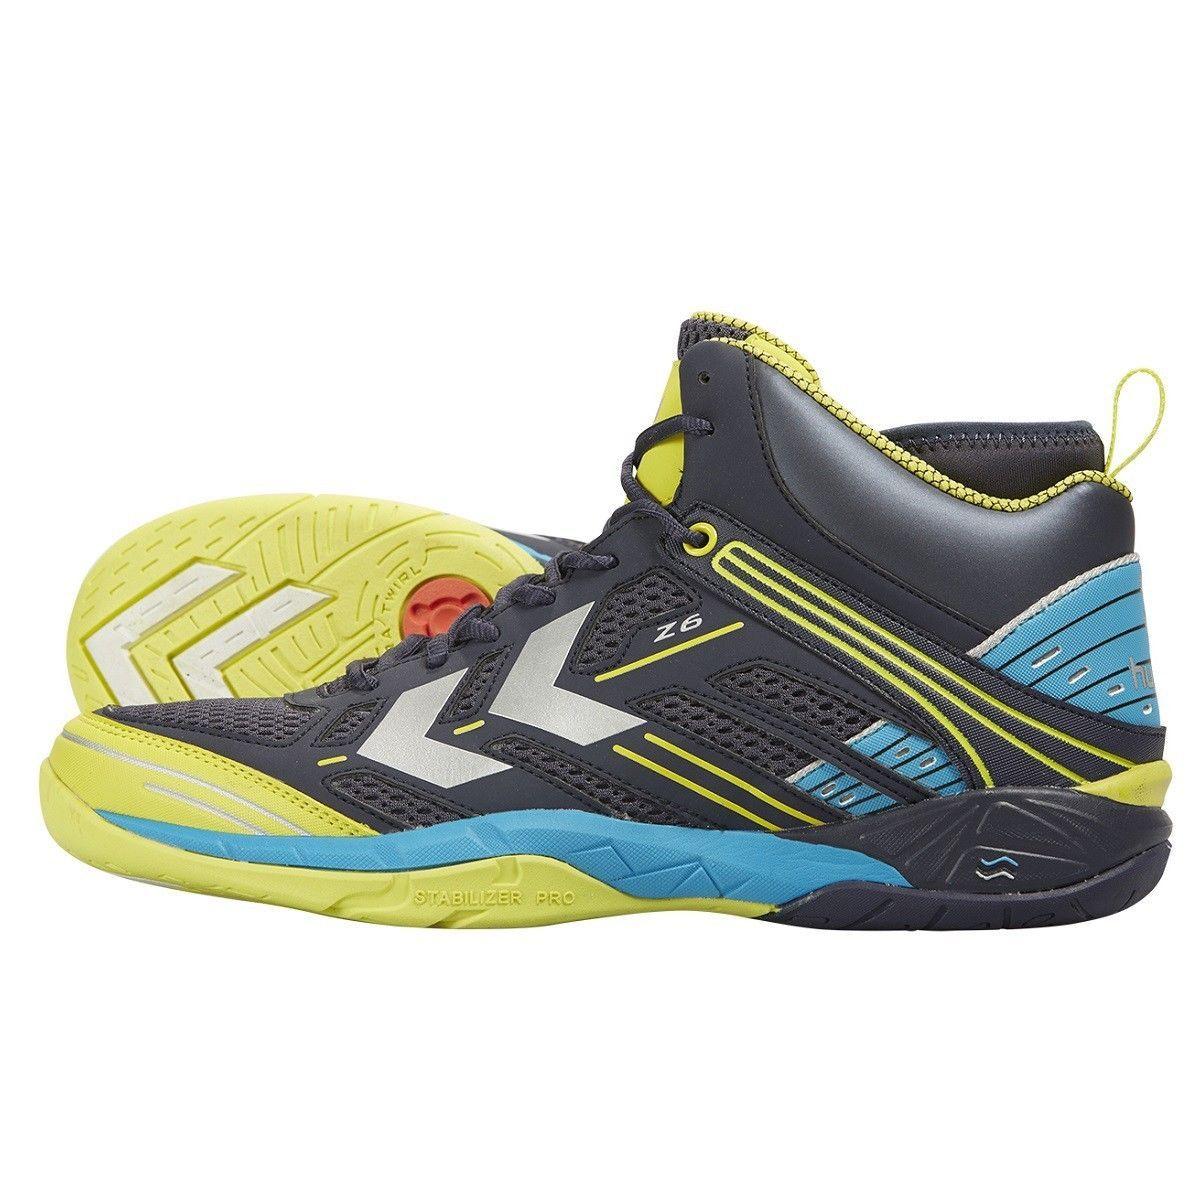 timeless design 7d487 8fb3f HUMMEL OMNICOURT Z6 HI 42 45 NEW 110€ MODEL 2015 indoor handball shoes z8  x8 x6   eBay